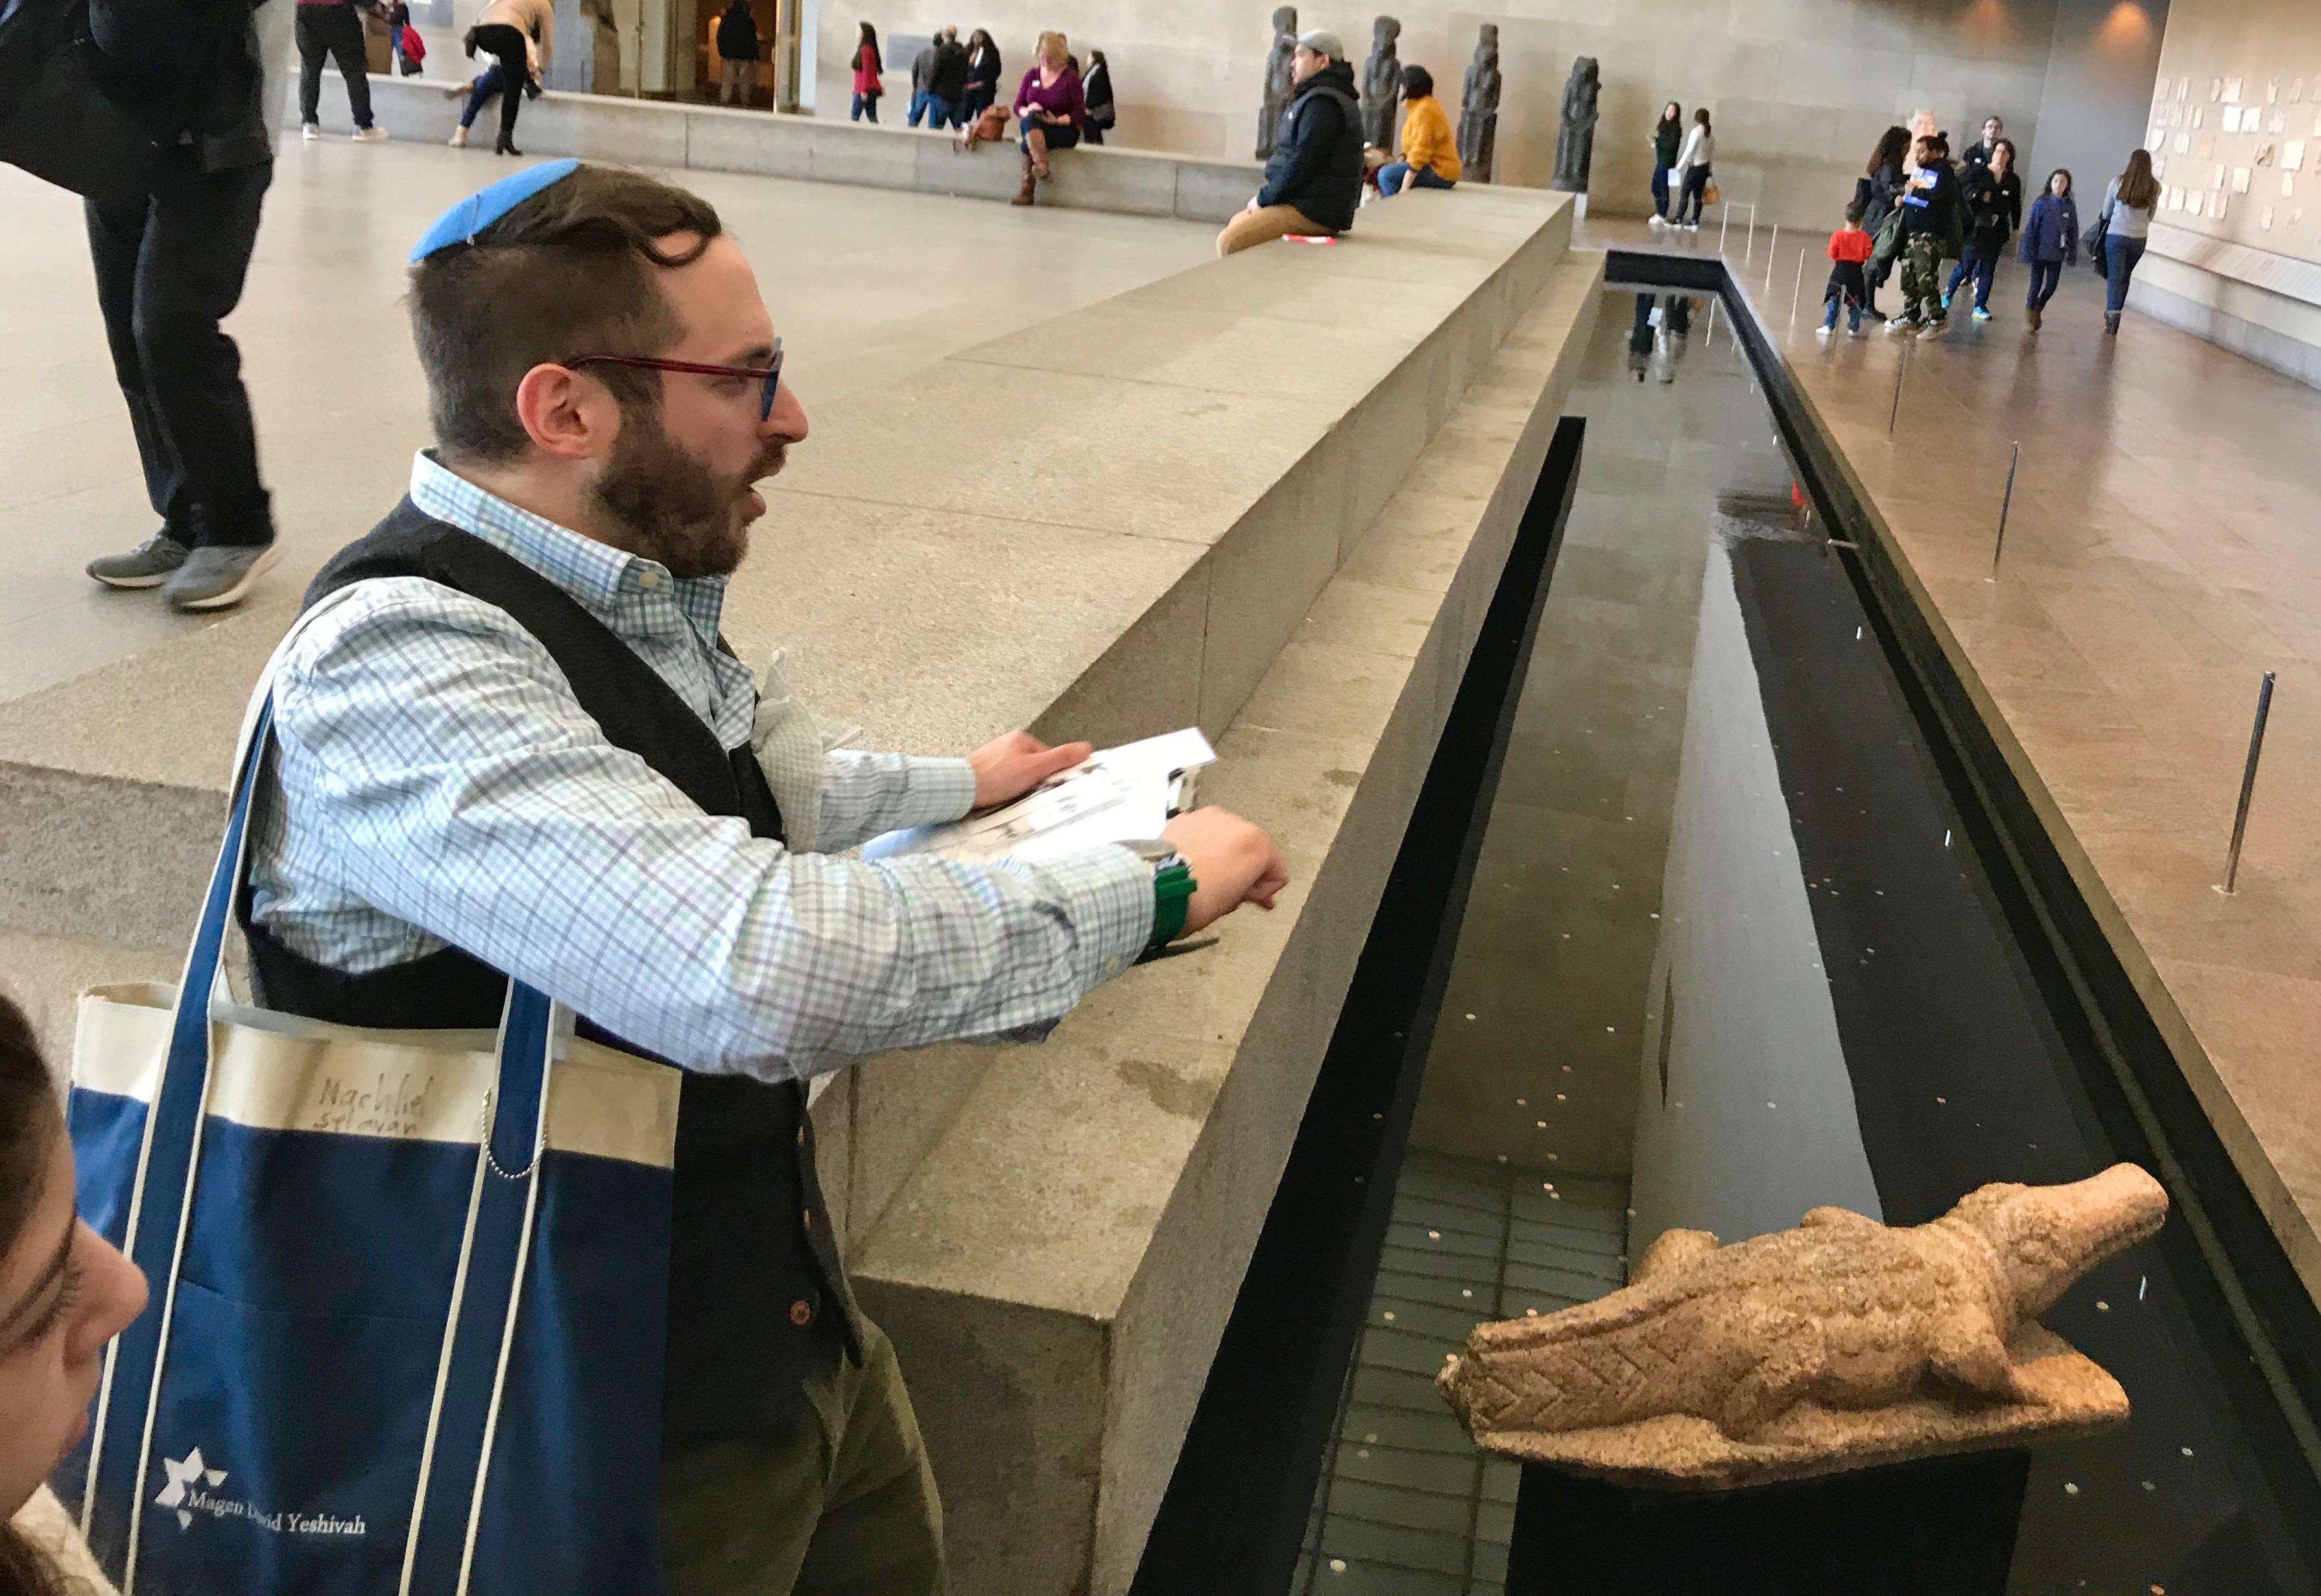 Nachliel Selavan giving a tour at the Metropolitan Museum of Art in New York (Photo/JTA-Debra Nussbaum Cohen)